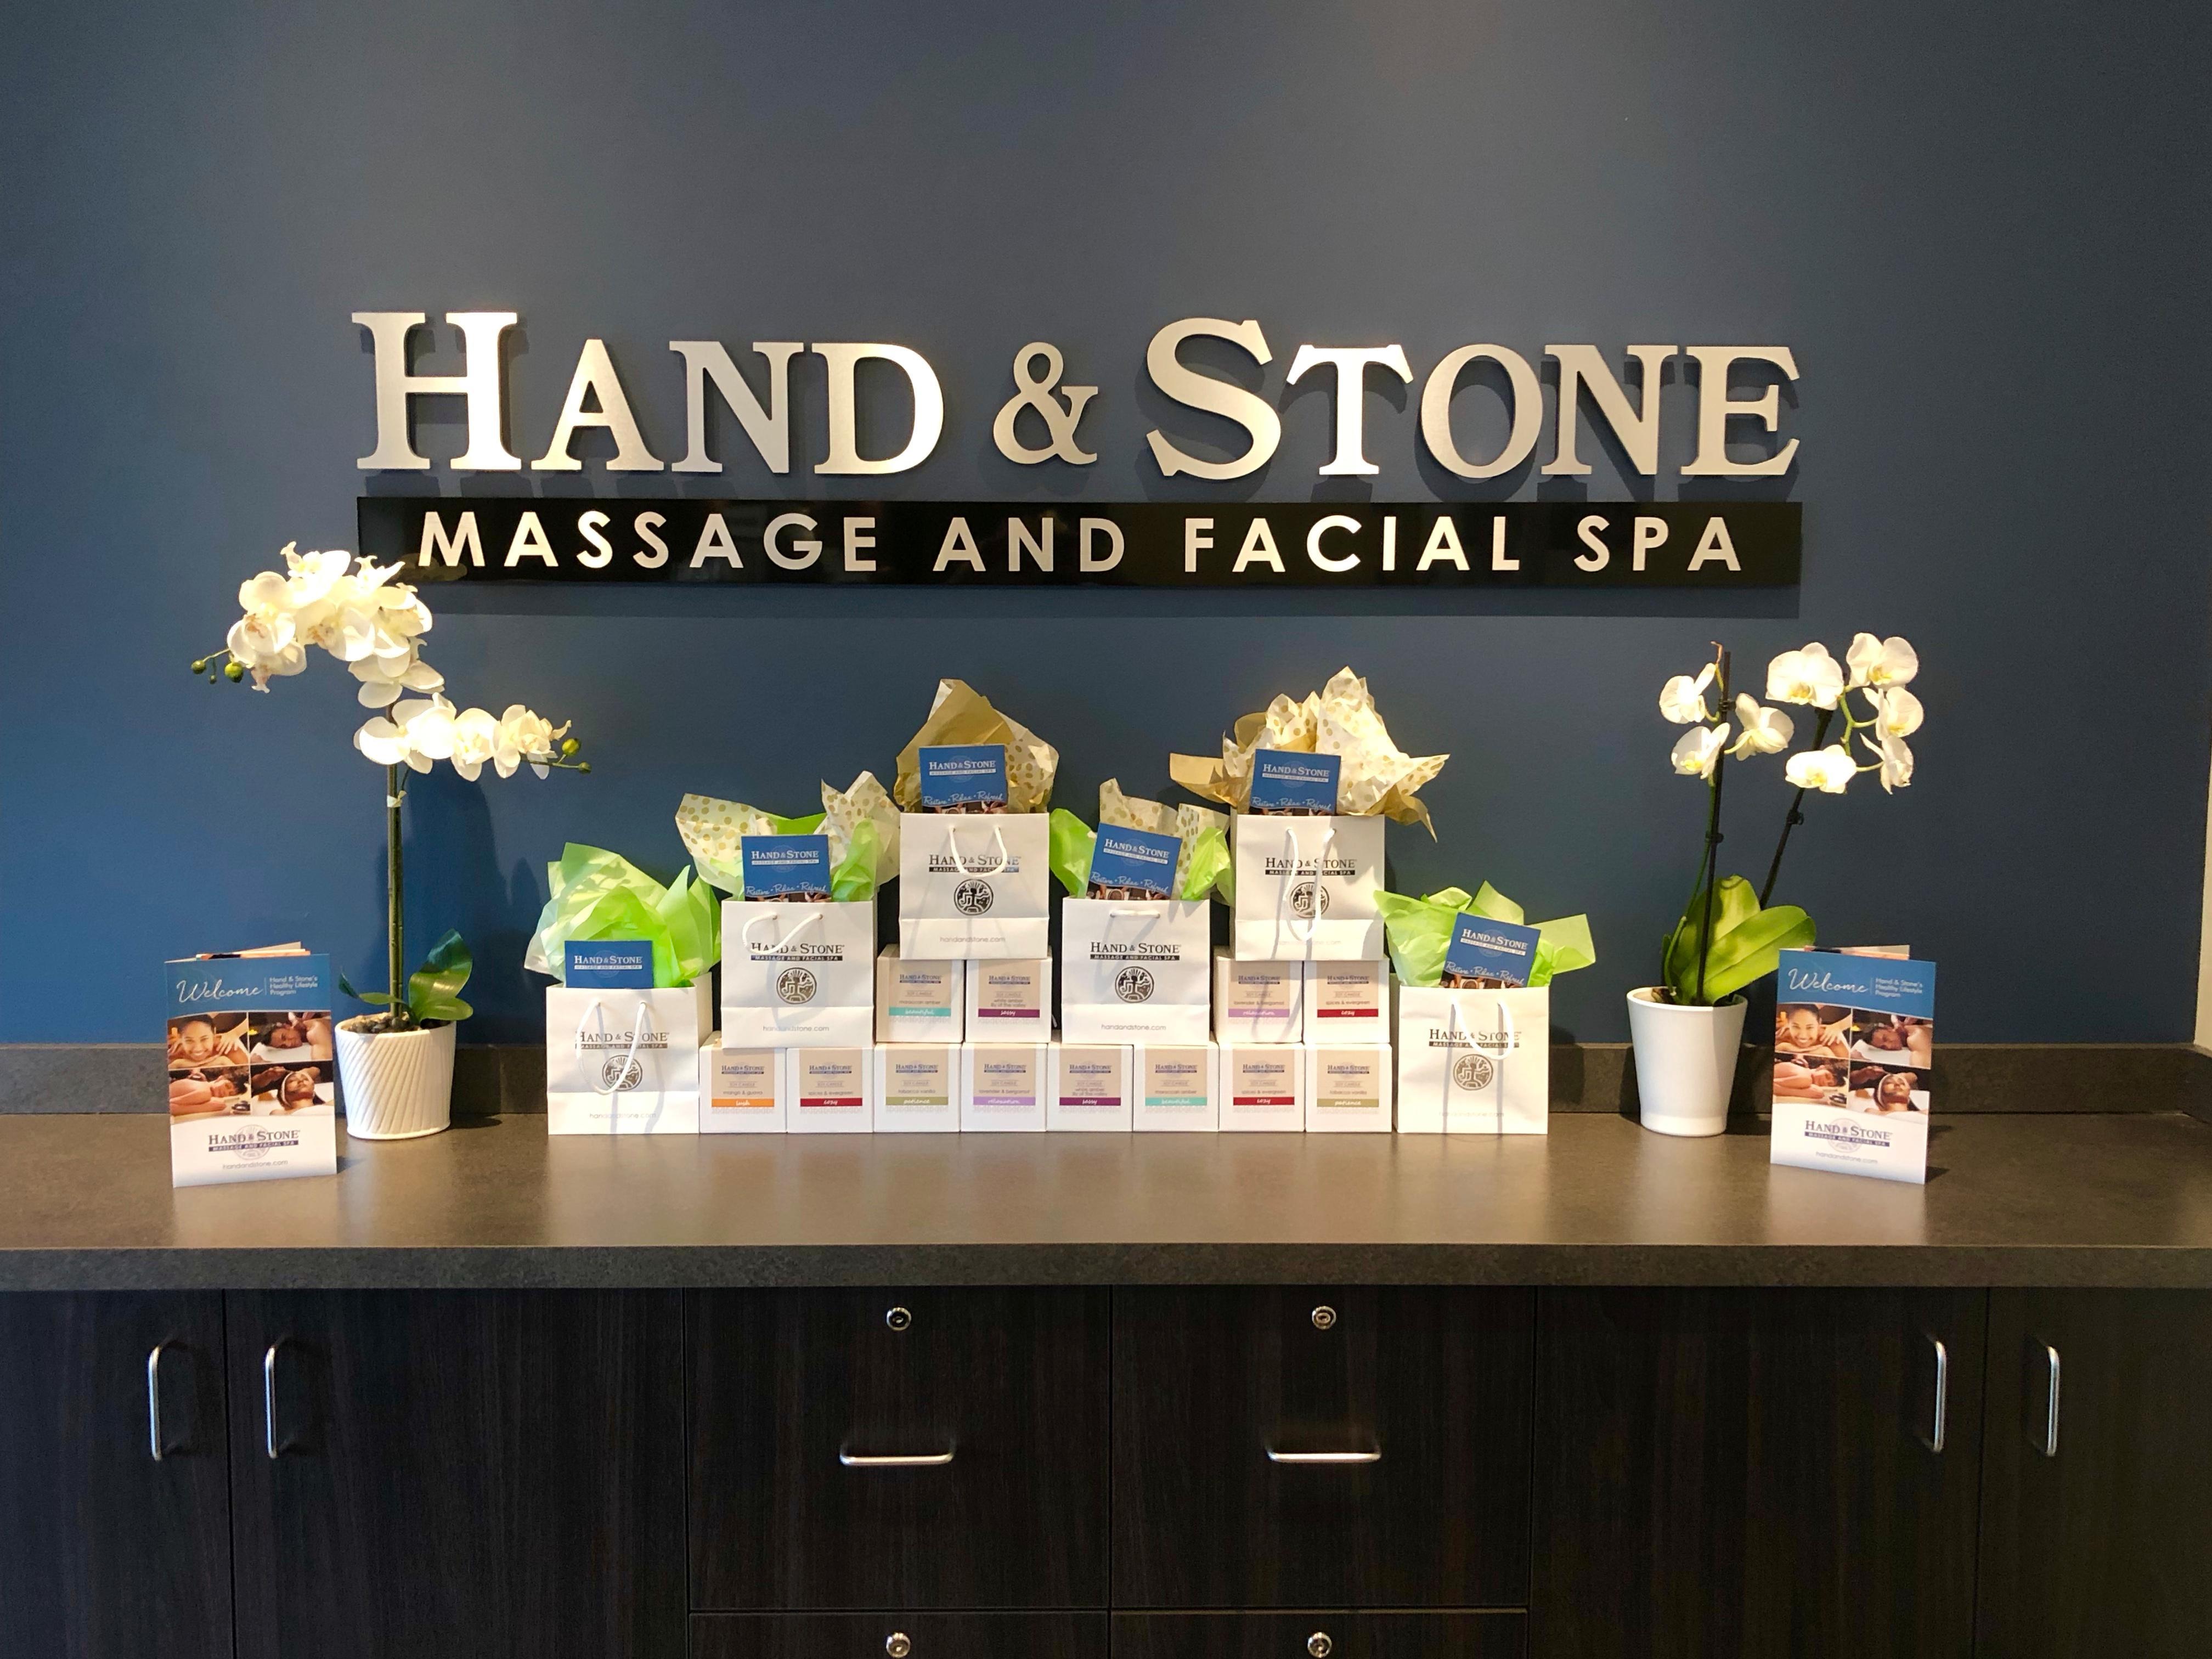 Hand & Stone Massage and Facial Spa - Kirkland